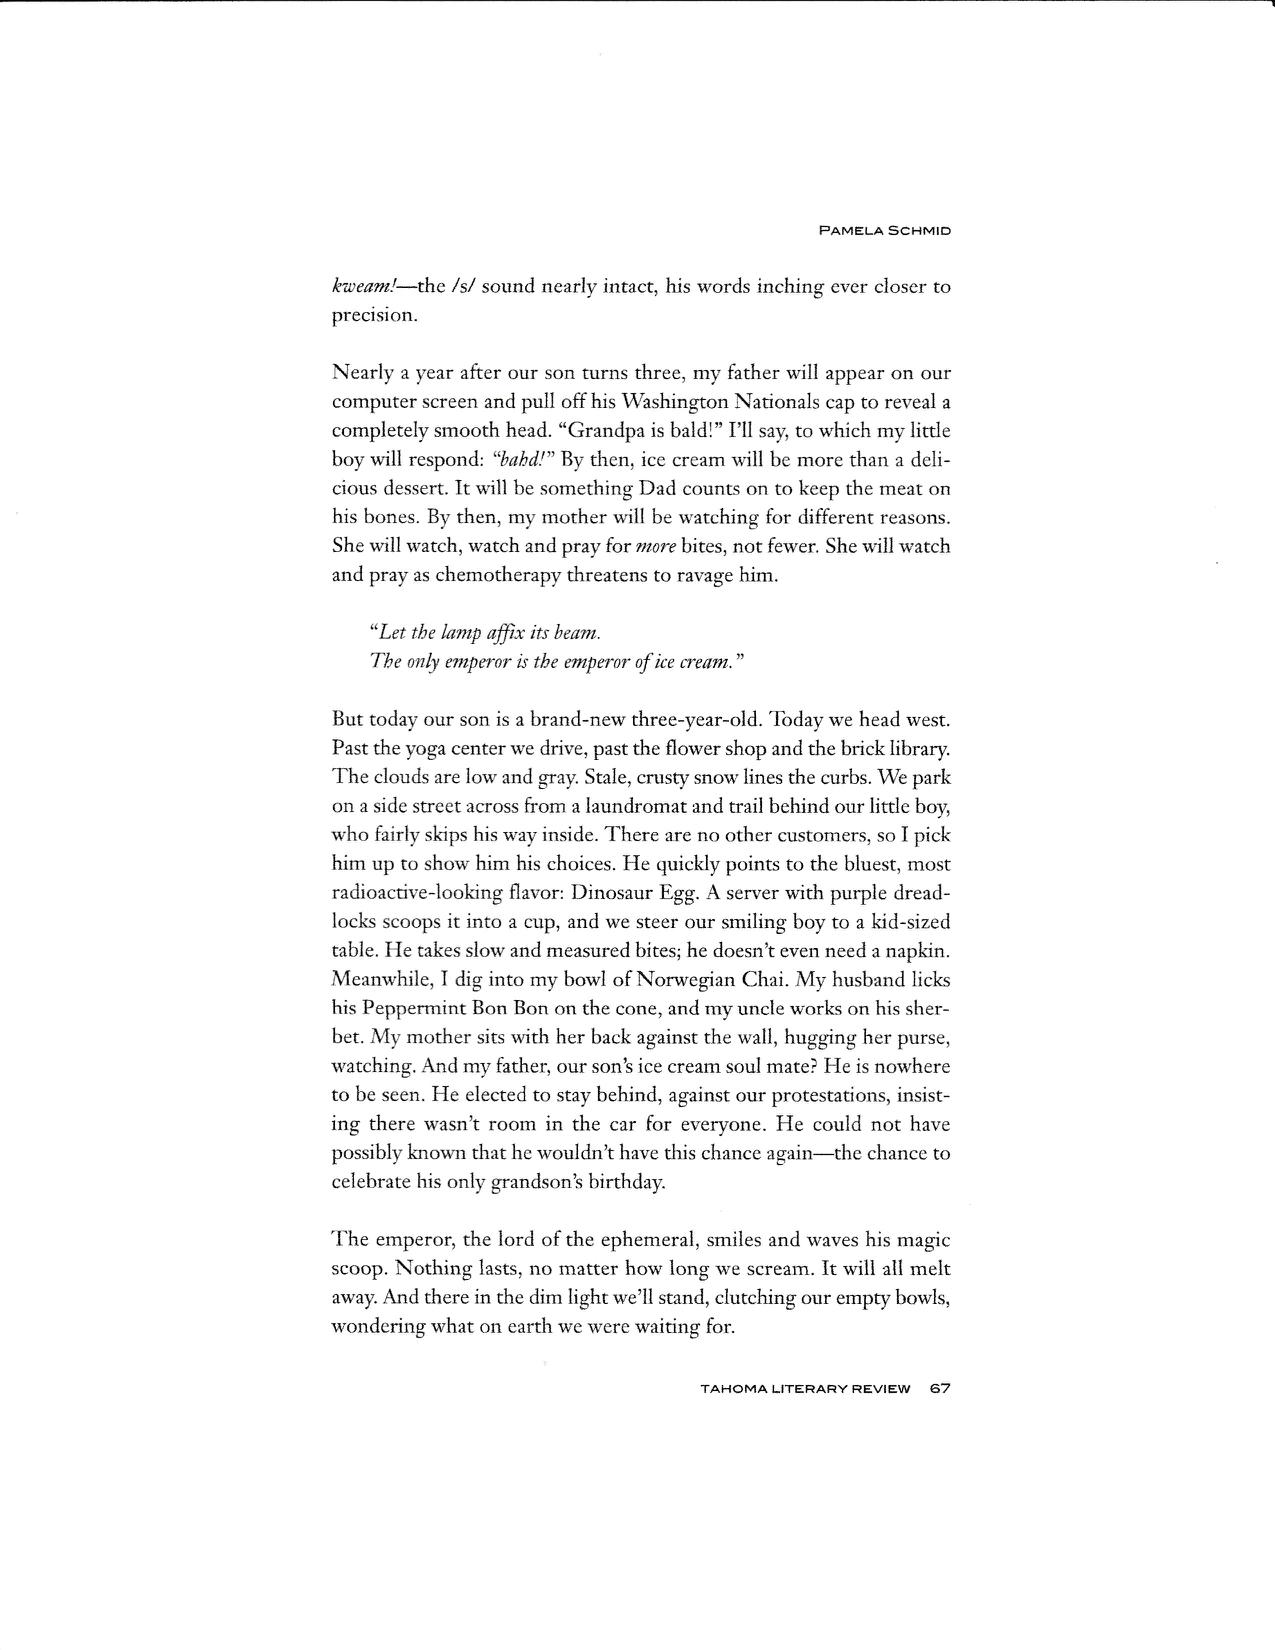 Tahoma_Literary_Review_The_Emperor 11.jpg